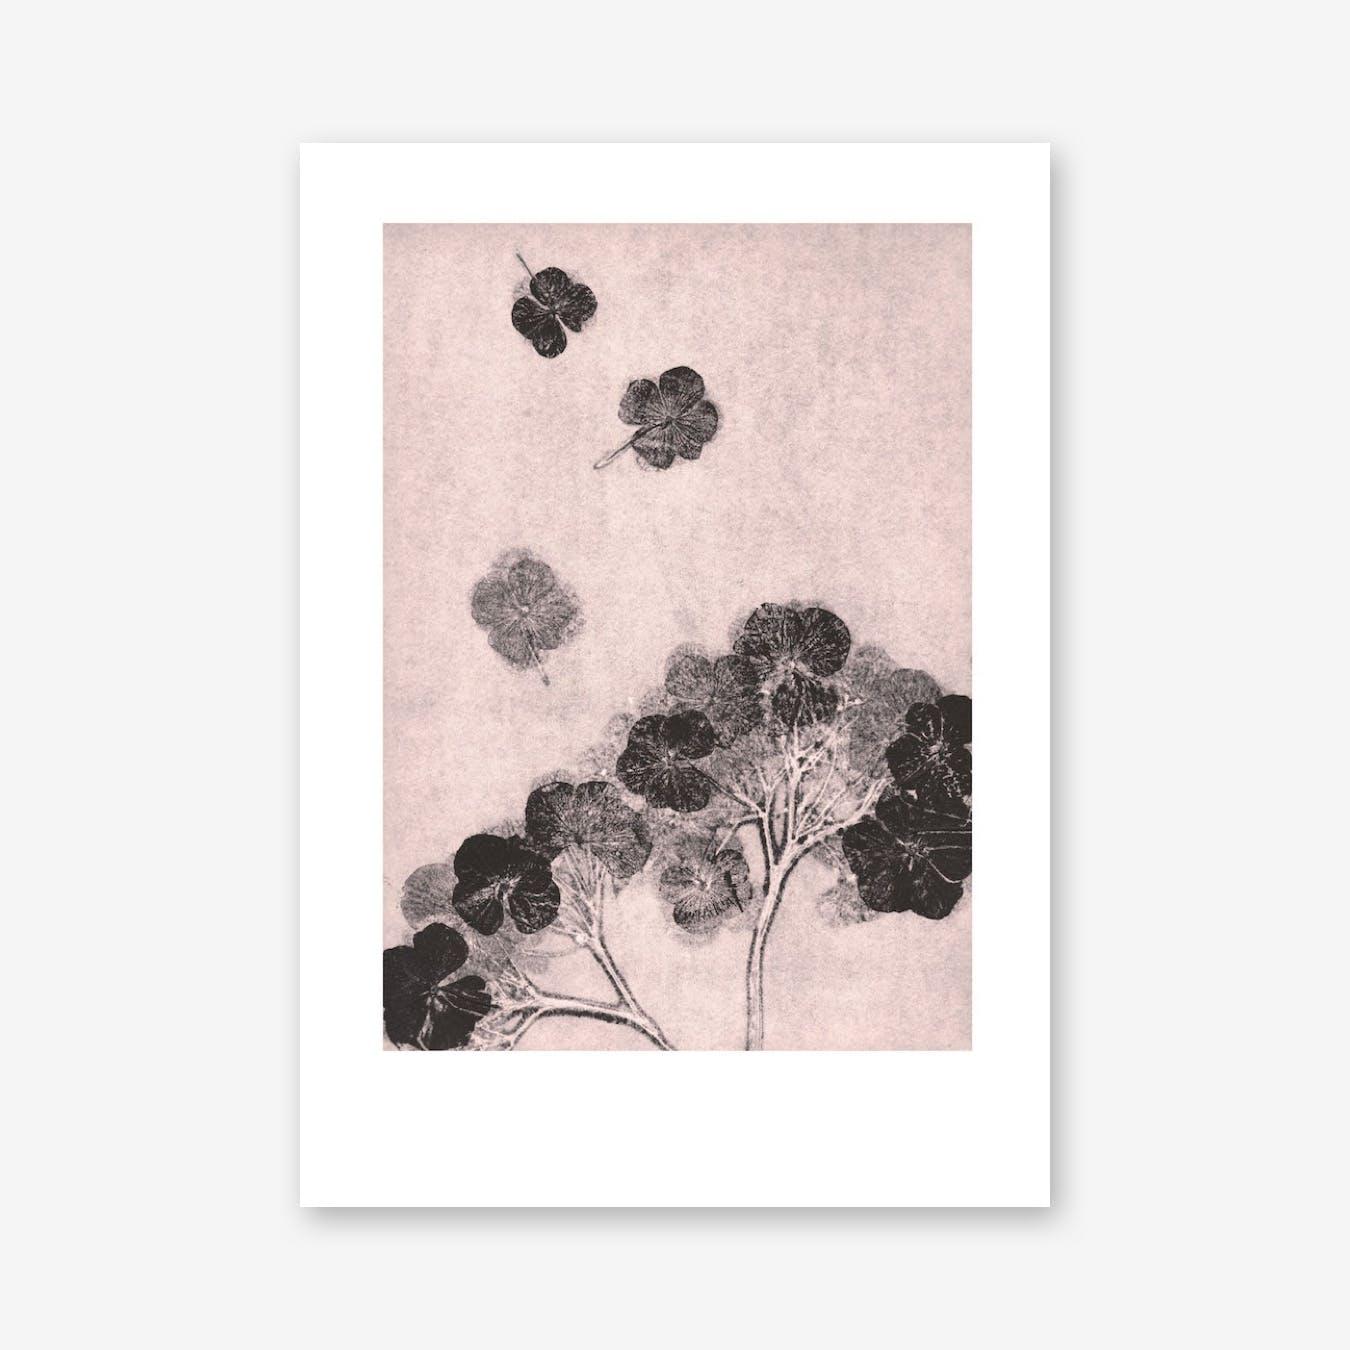 Hortensia Blush Print In 30cm x 40cm